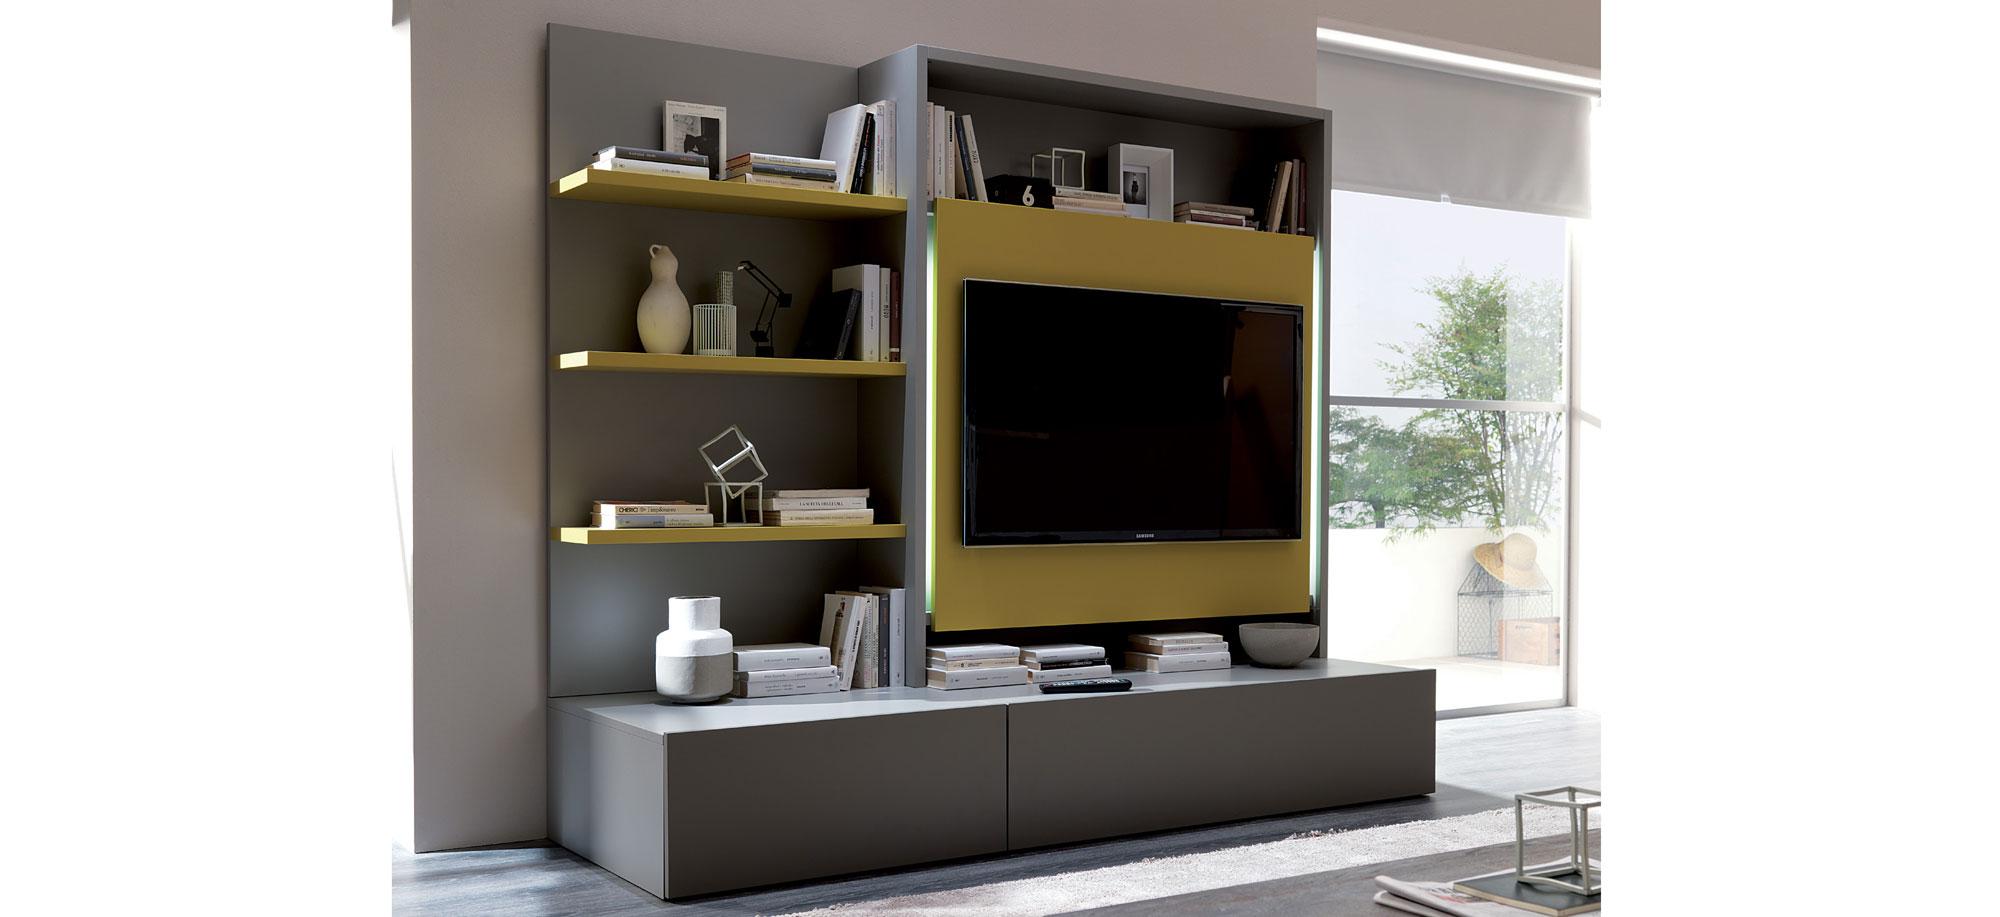 Mueble tv Moderno Smart en Portobellostreetes